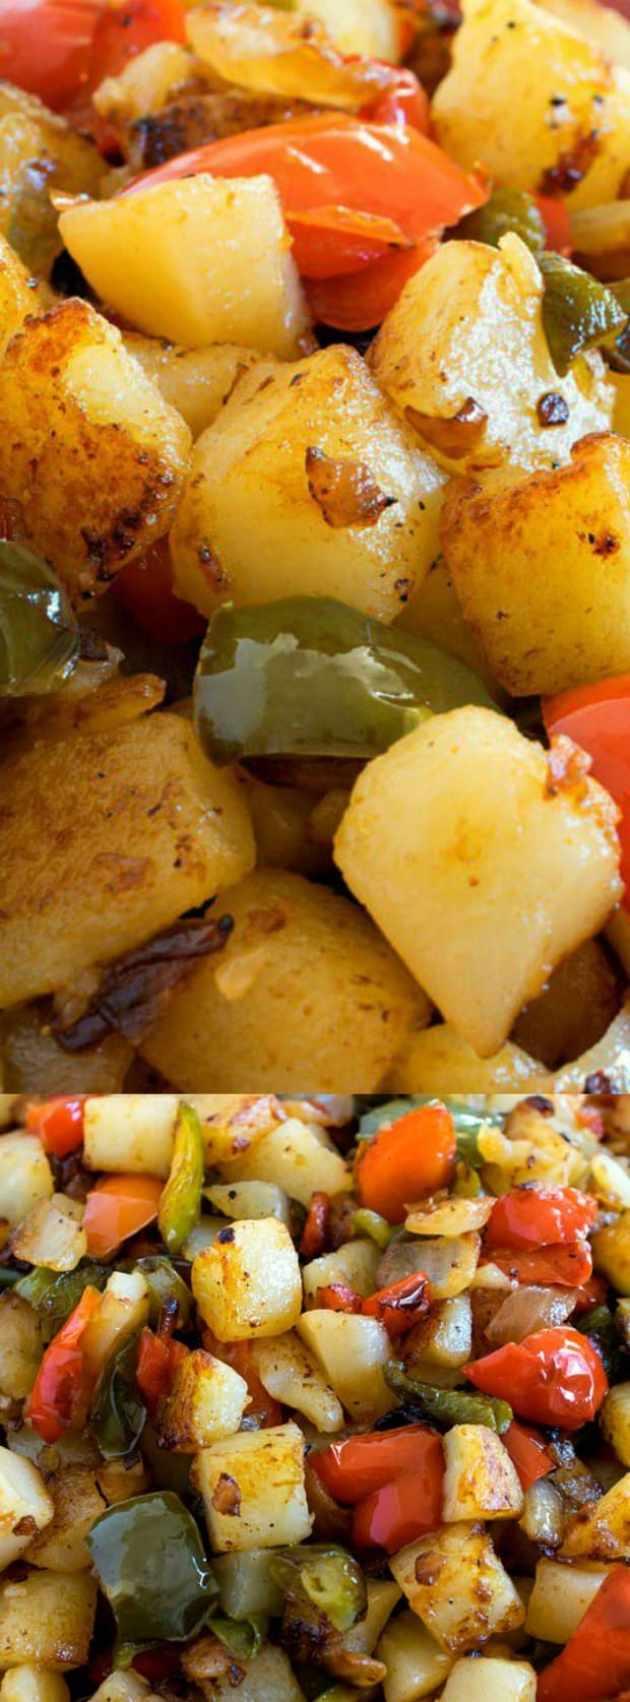 Potatoes Obrien Longpin